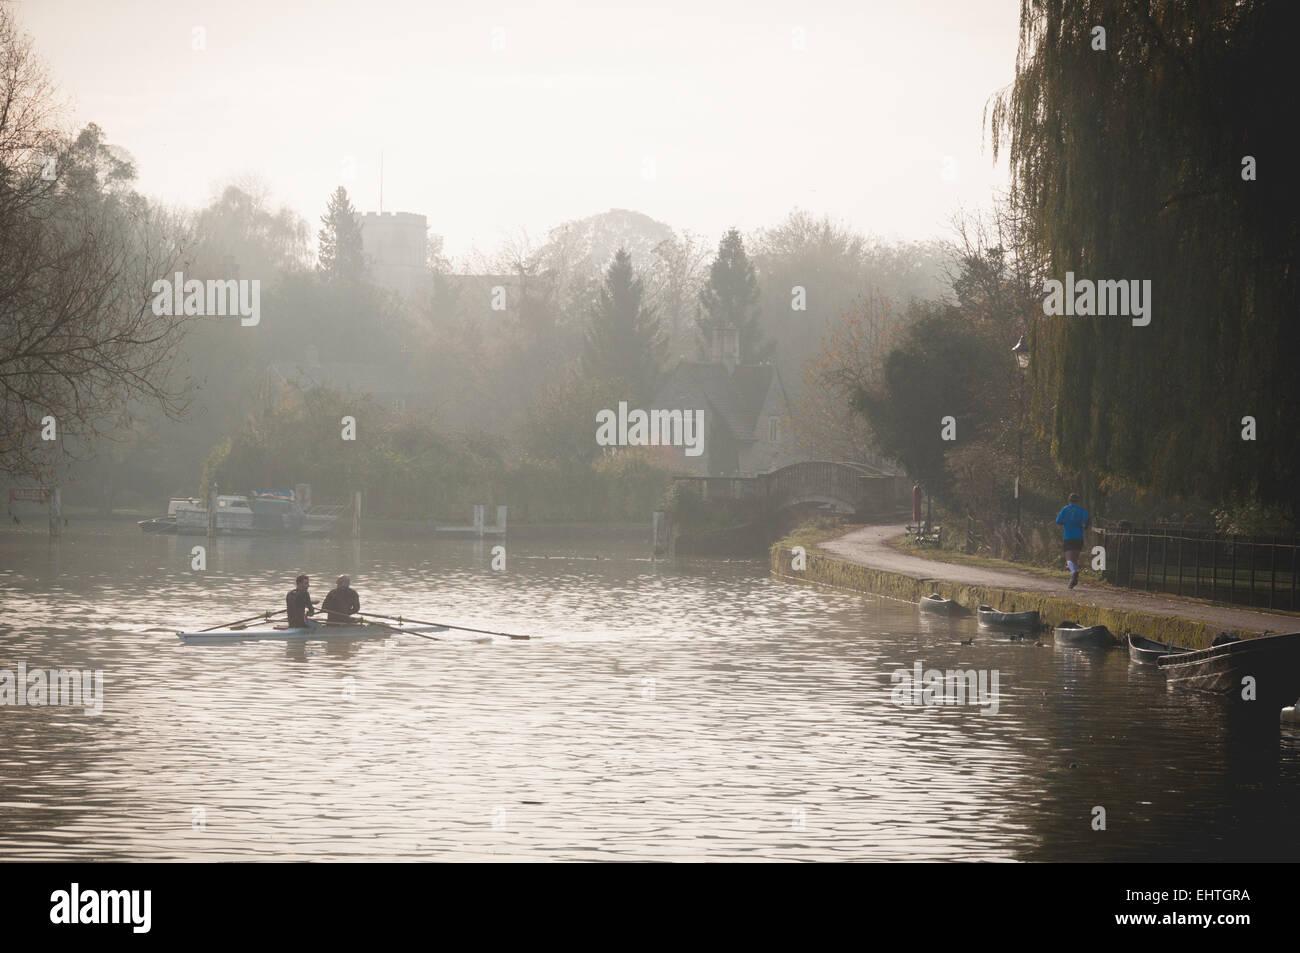 foggy-morning-in-iffley-lock-oxford-EHTGRA.jpg